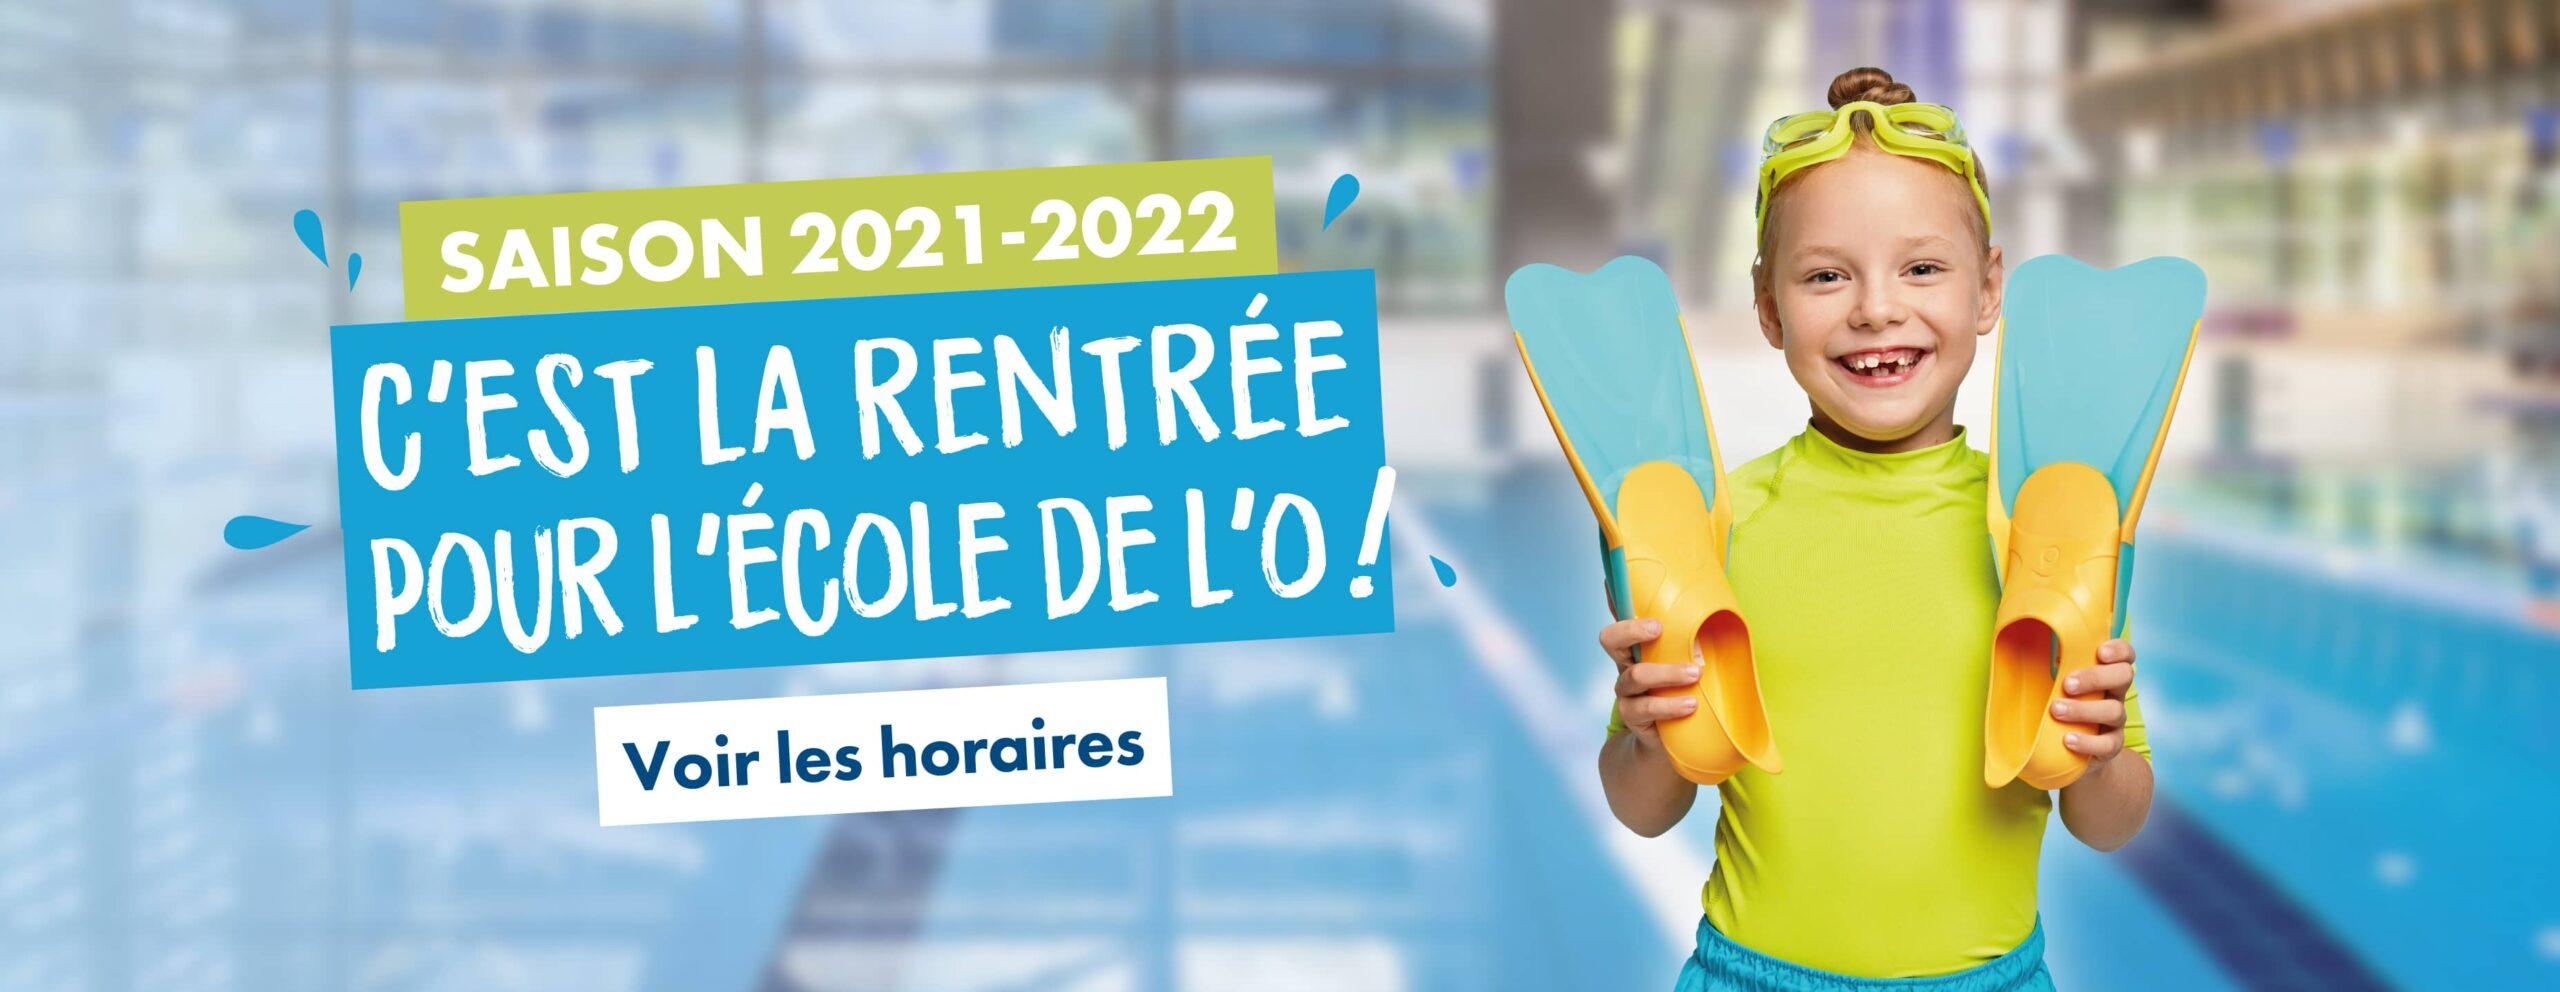 BANNIERE_RENTREE_2021-2022-ECOLE_COMPRESS